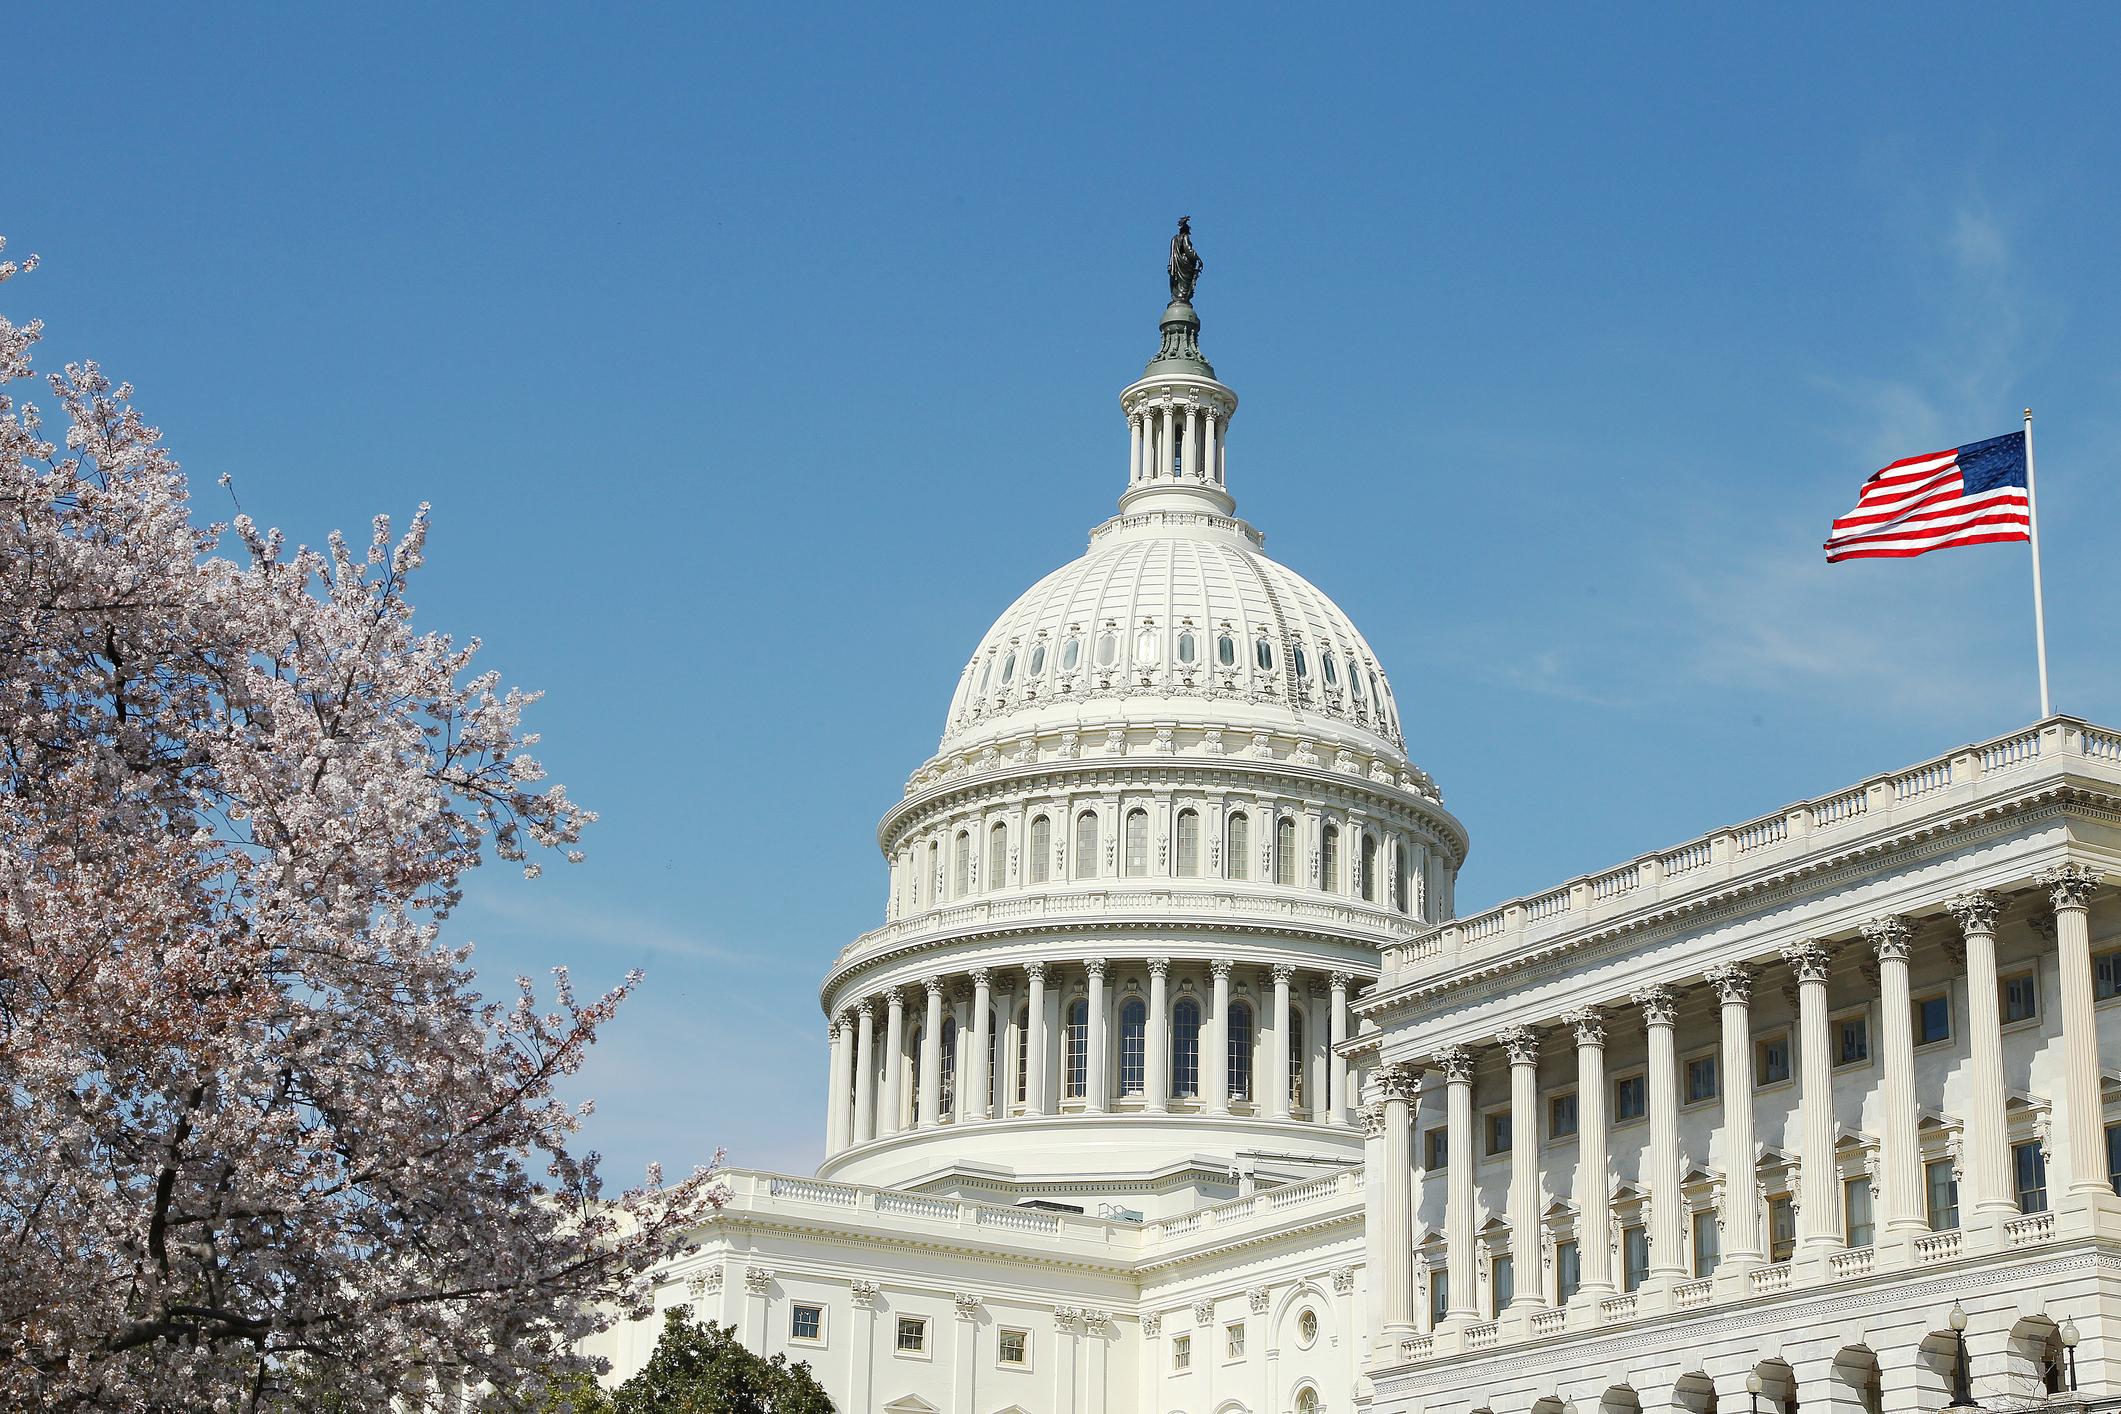 US_Capitol_building_spring_trees_fullsize_12[1].jpg